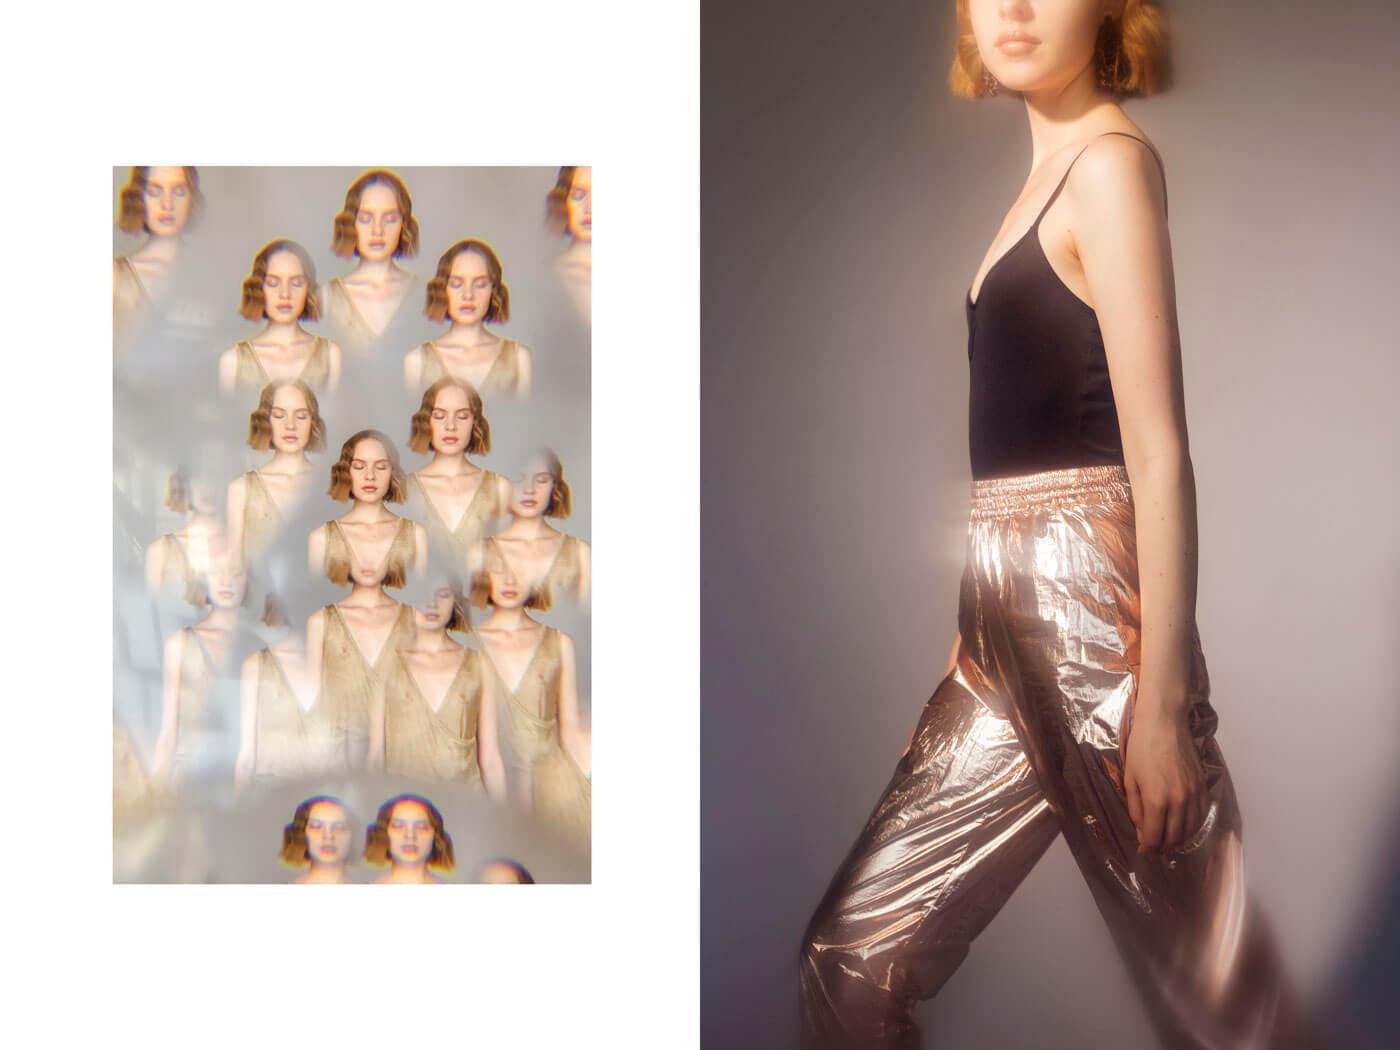 flanelle-editorial-maquillaje-peinado-moda-barcelona-1_4